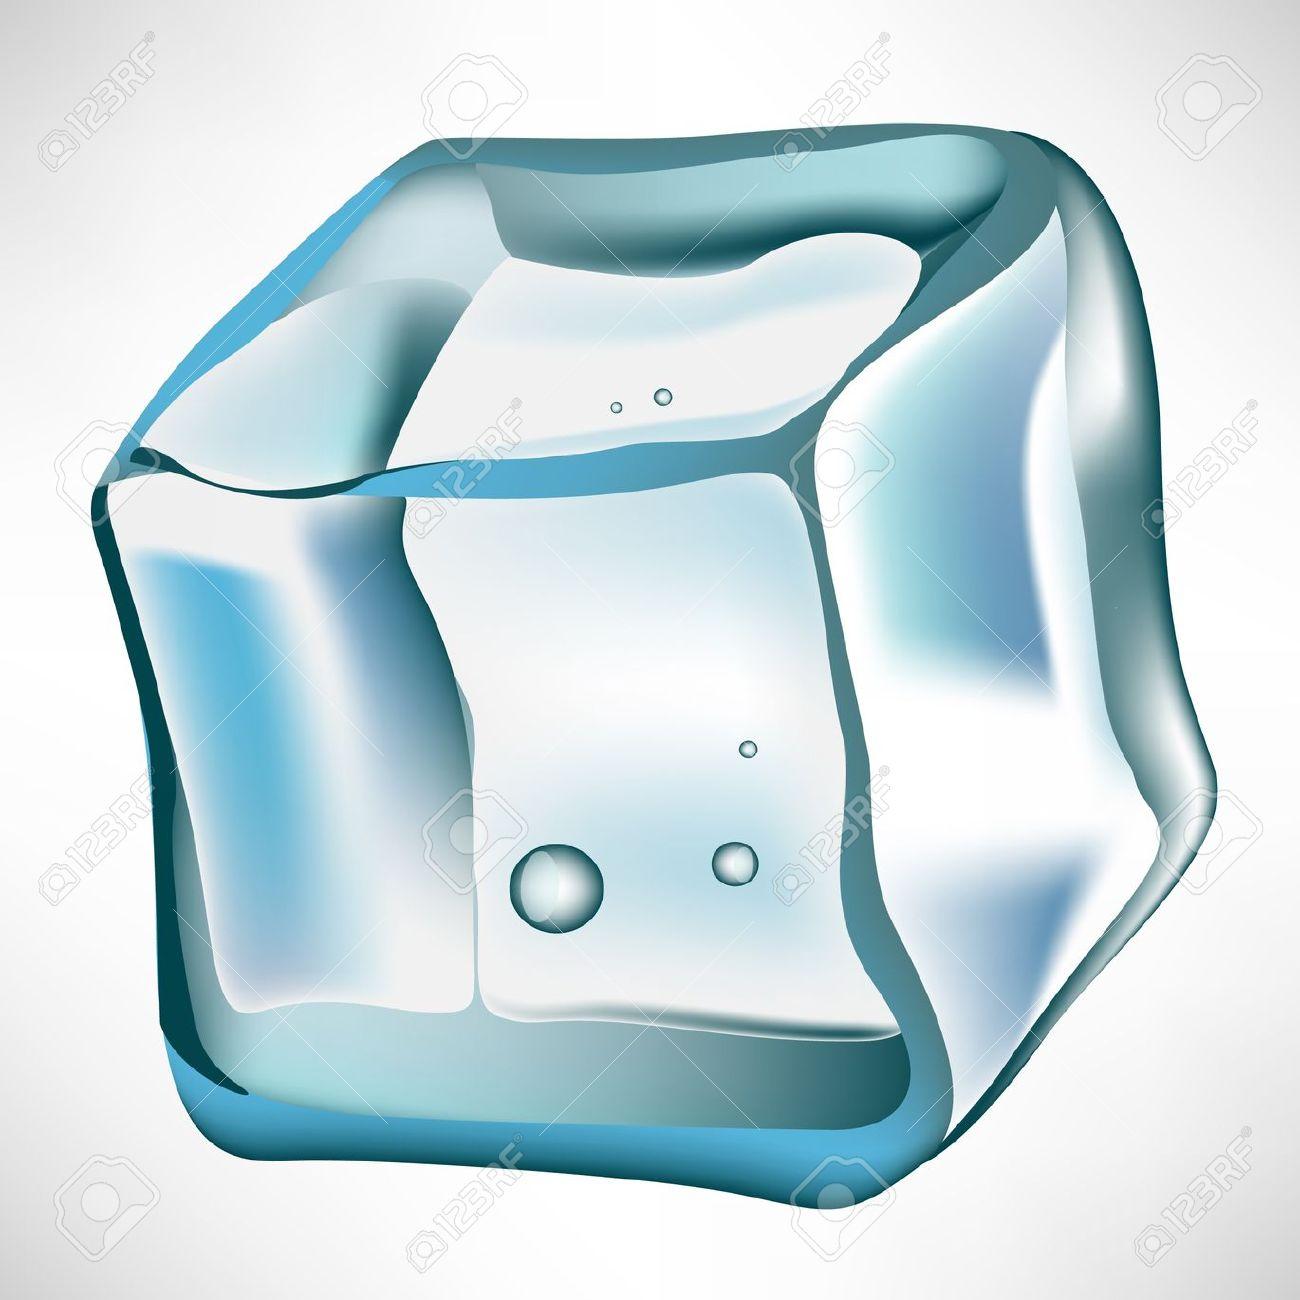 Ice Cube clipart Clipart Icecube Ice Clipart ice